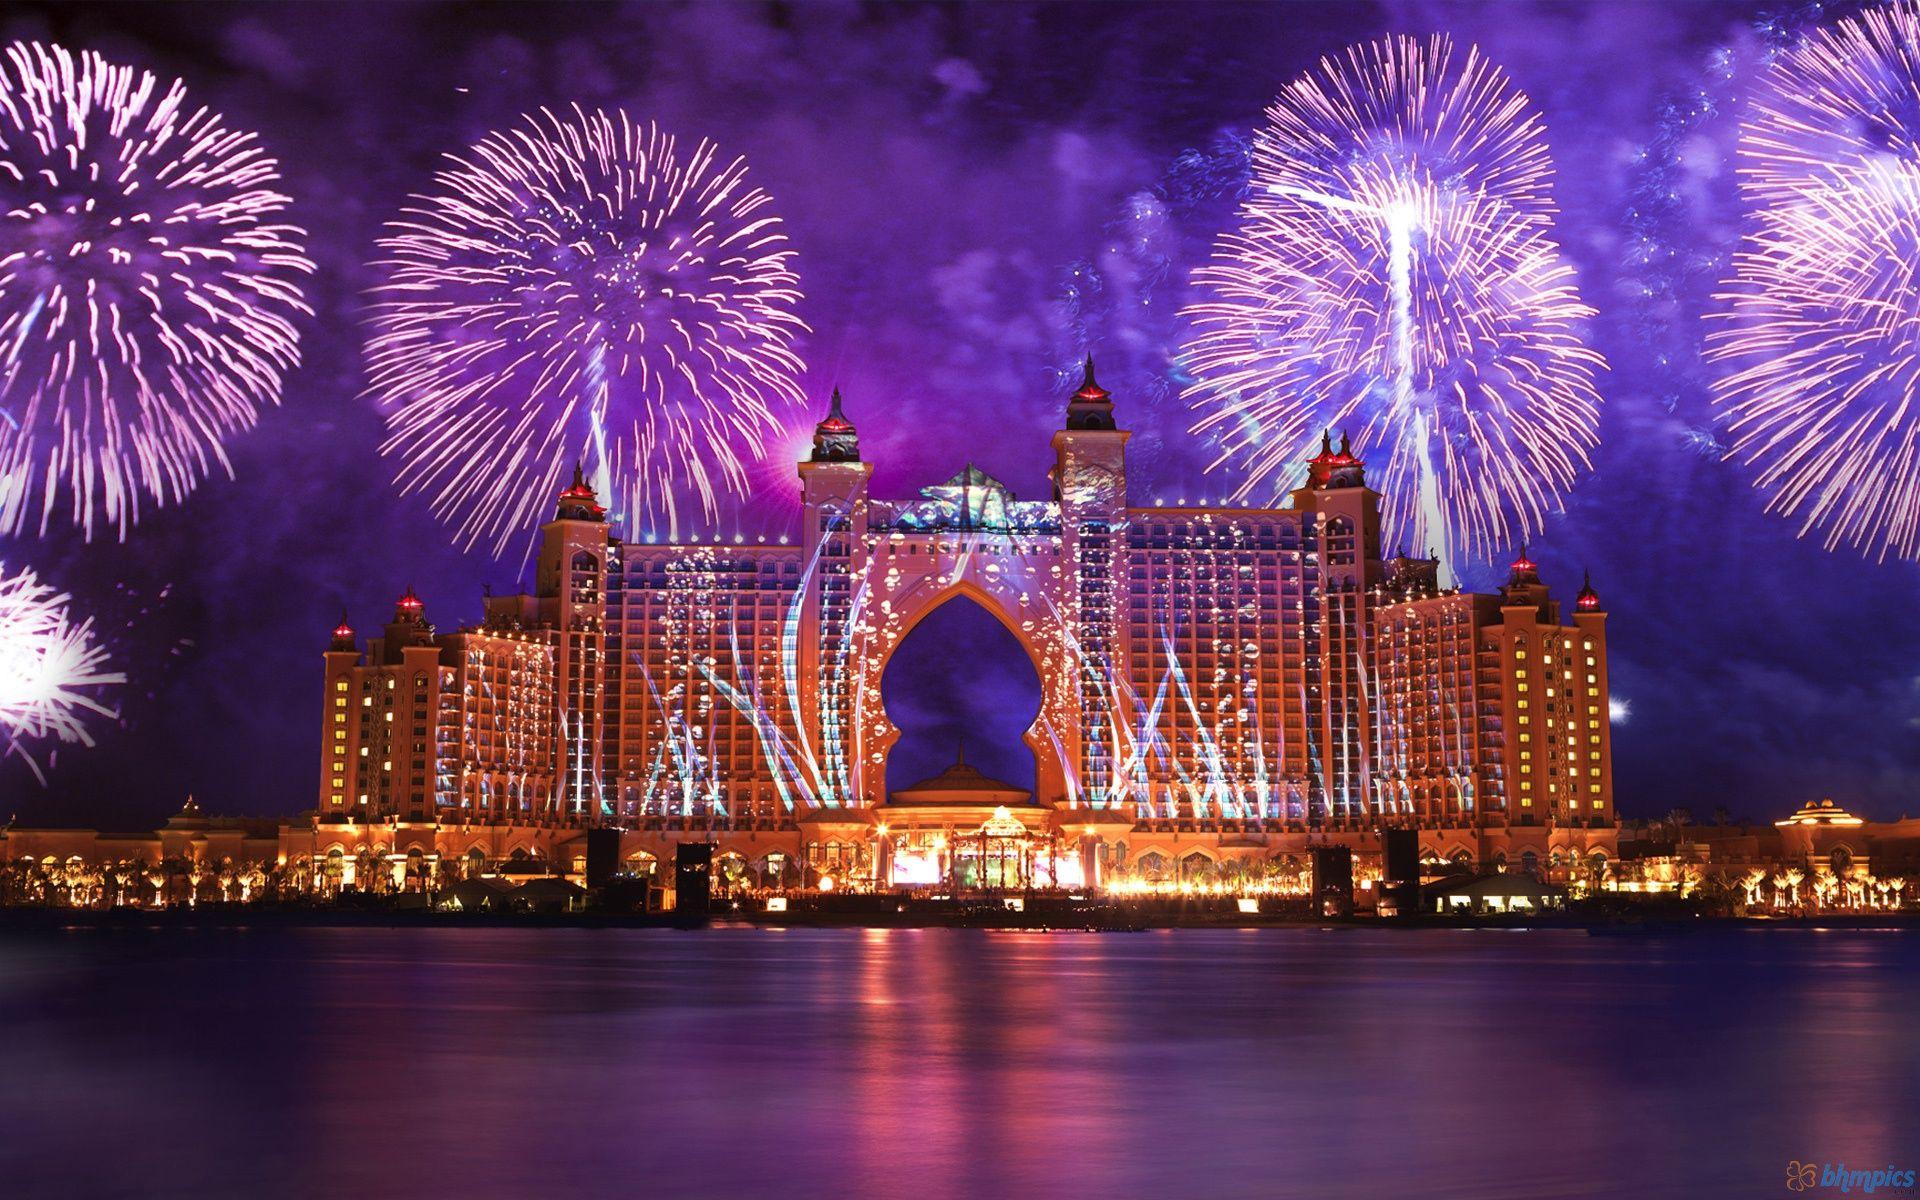 New Year's Eve at Atlantis The Palm Dubai